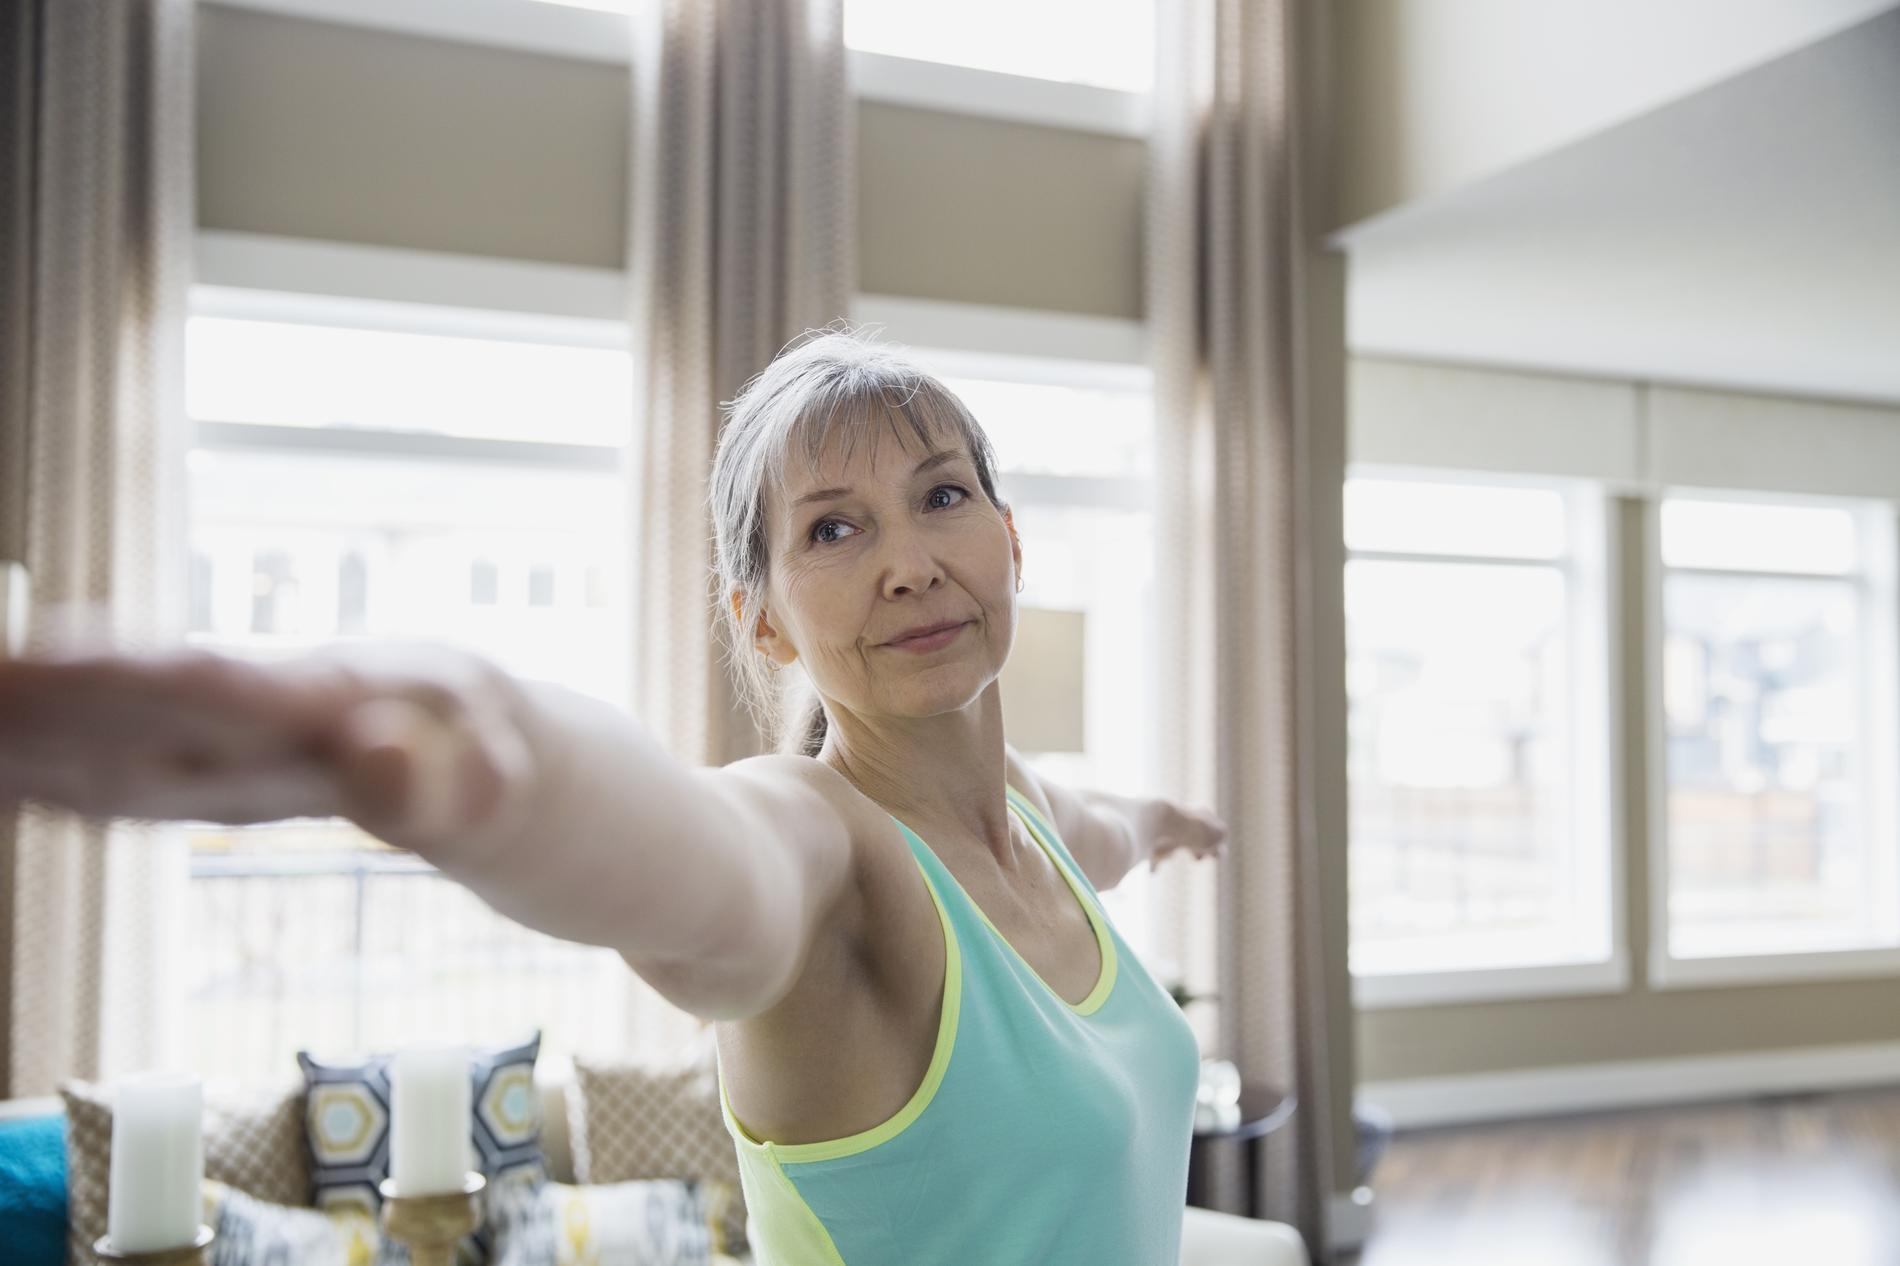 menu equilibre pour femme menopausee